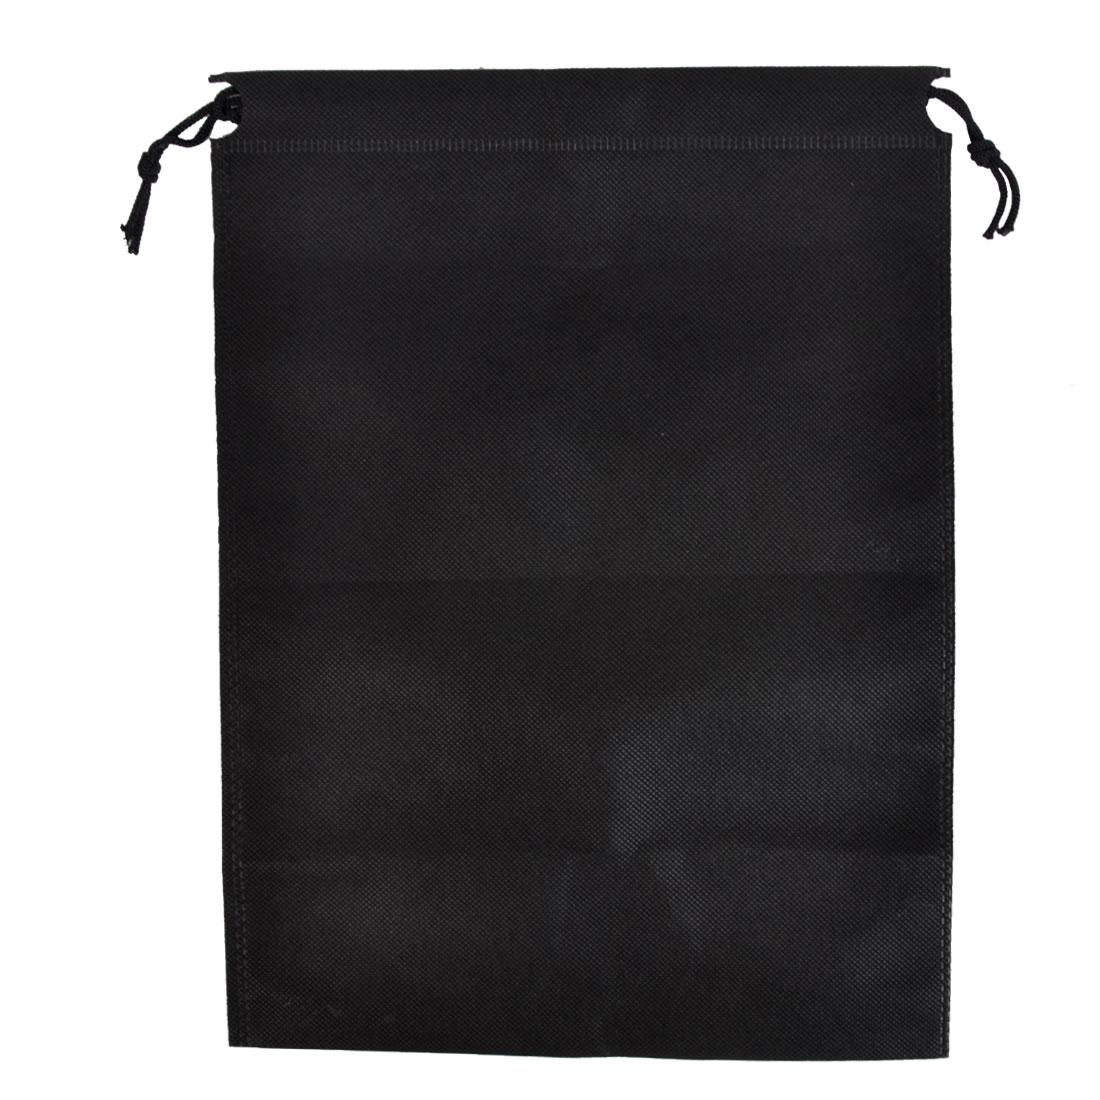 Clothes Dust Cover Storage Travel Drawstring Bags 34 x 25cm Black